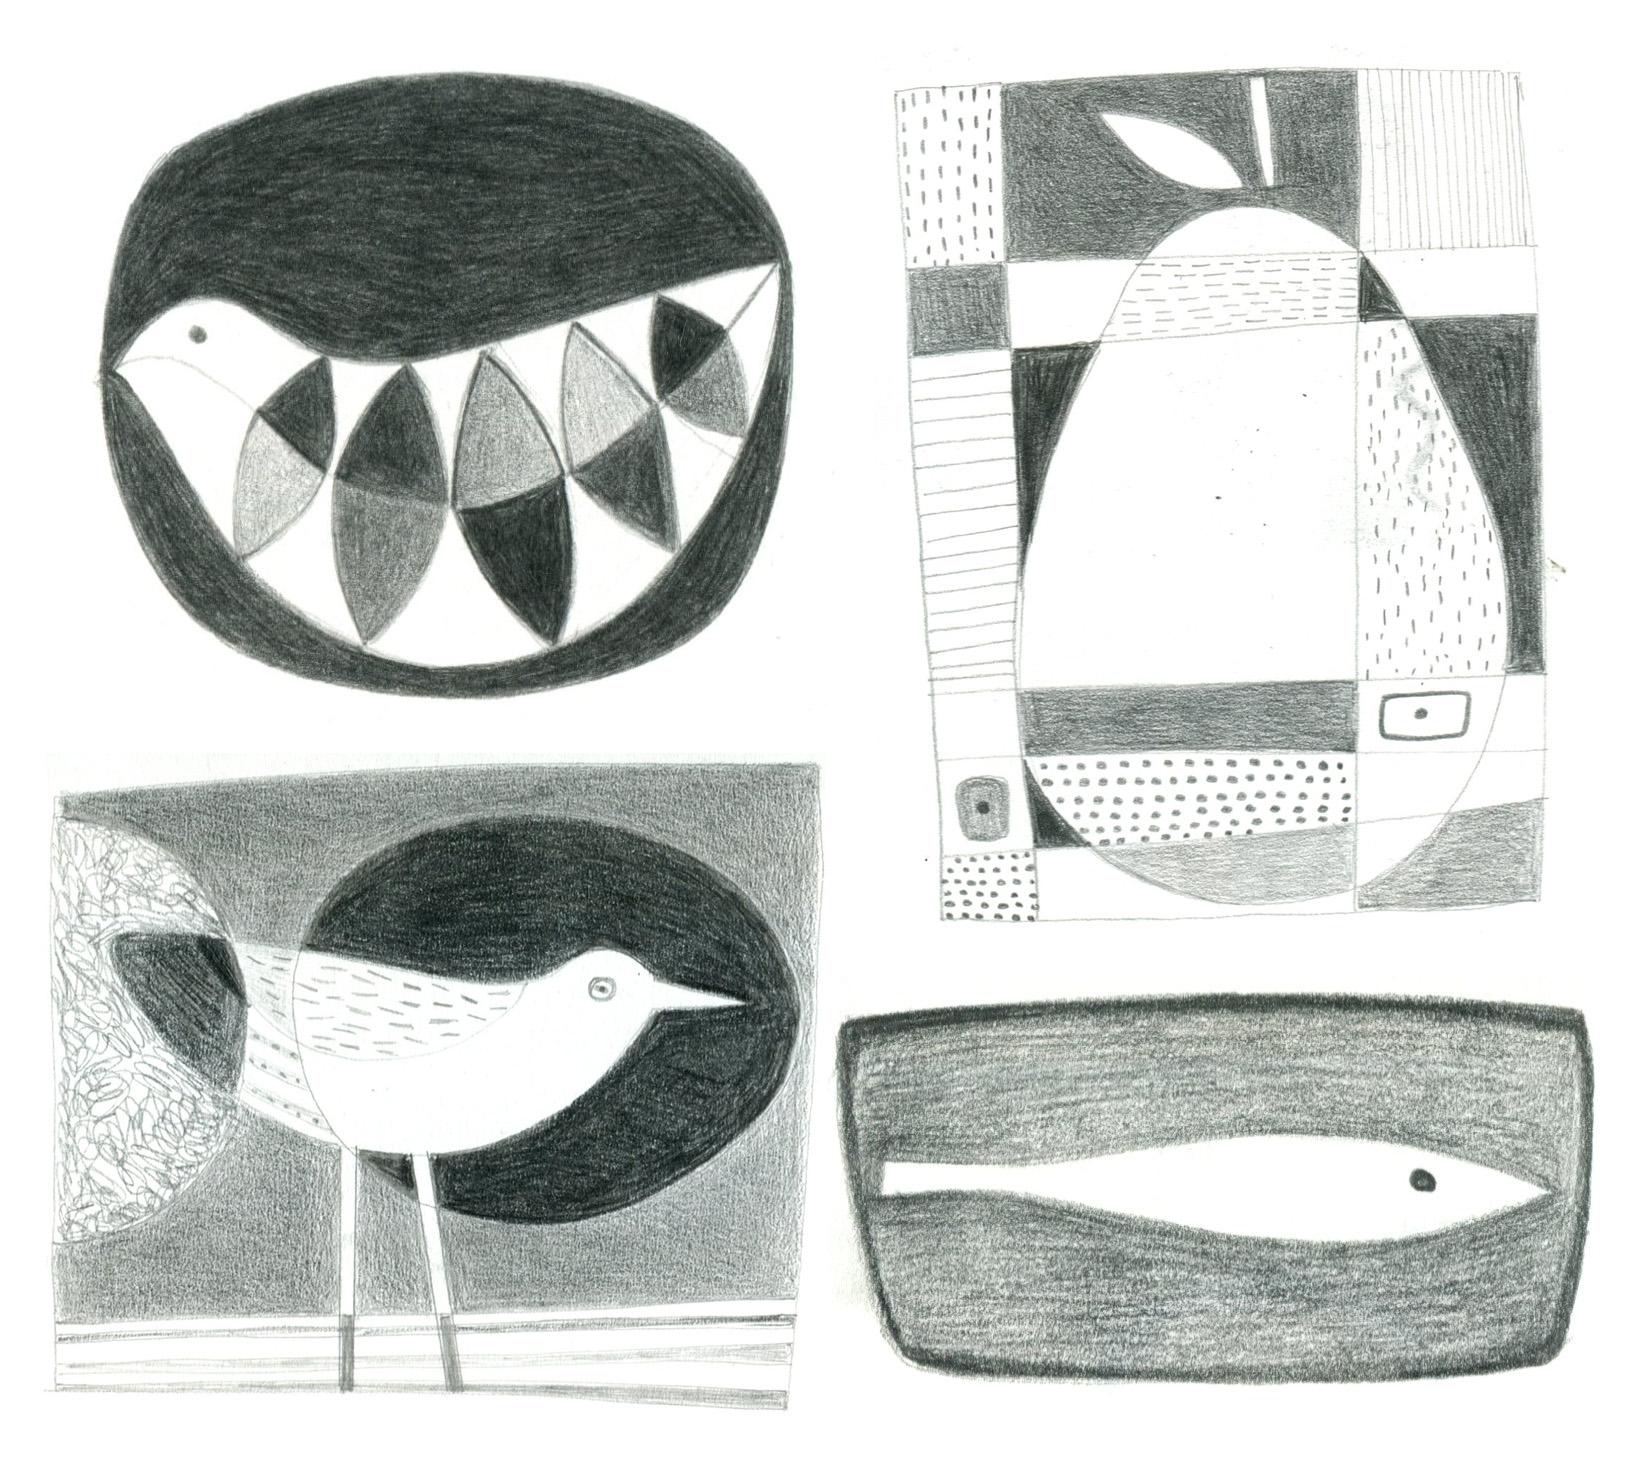 Drawings by Sarah Hamilton